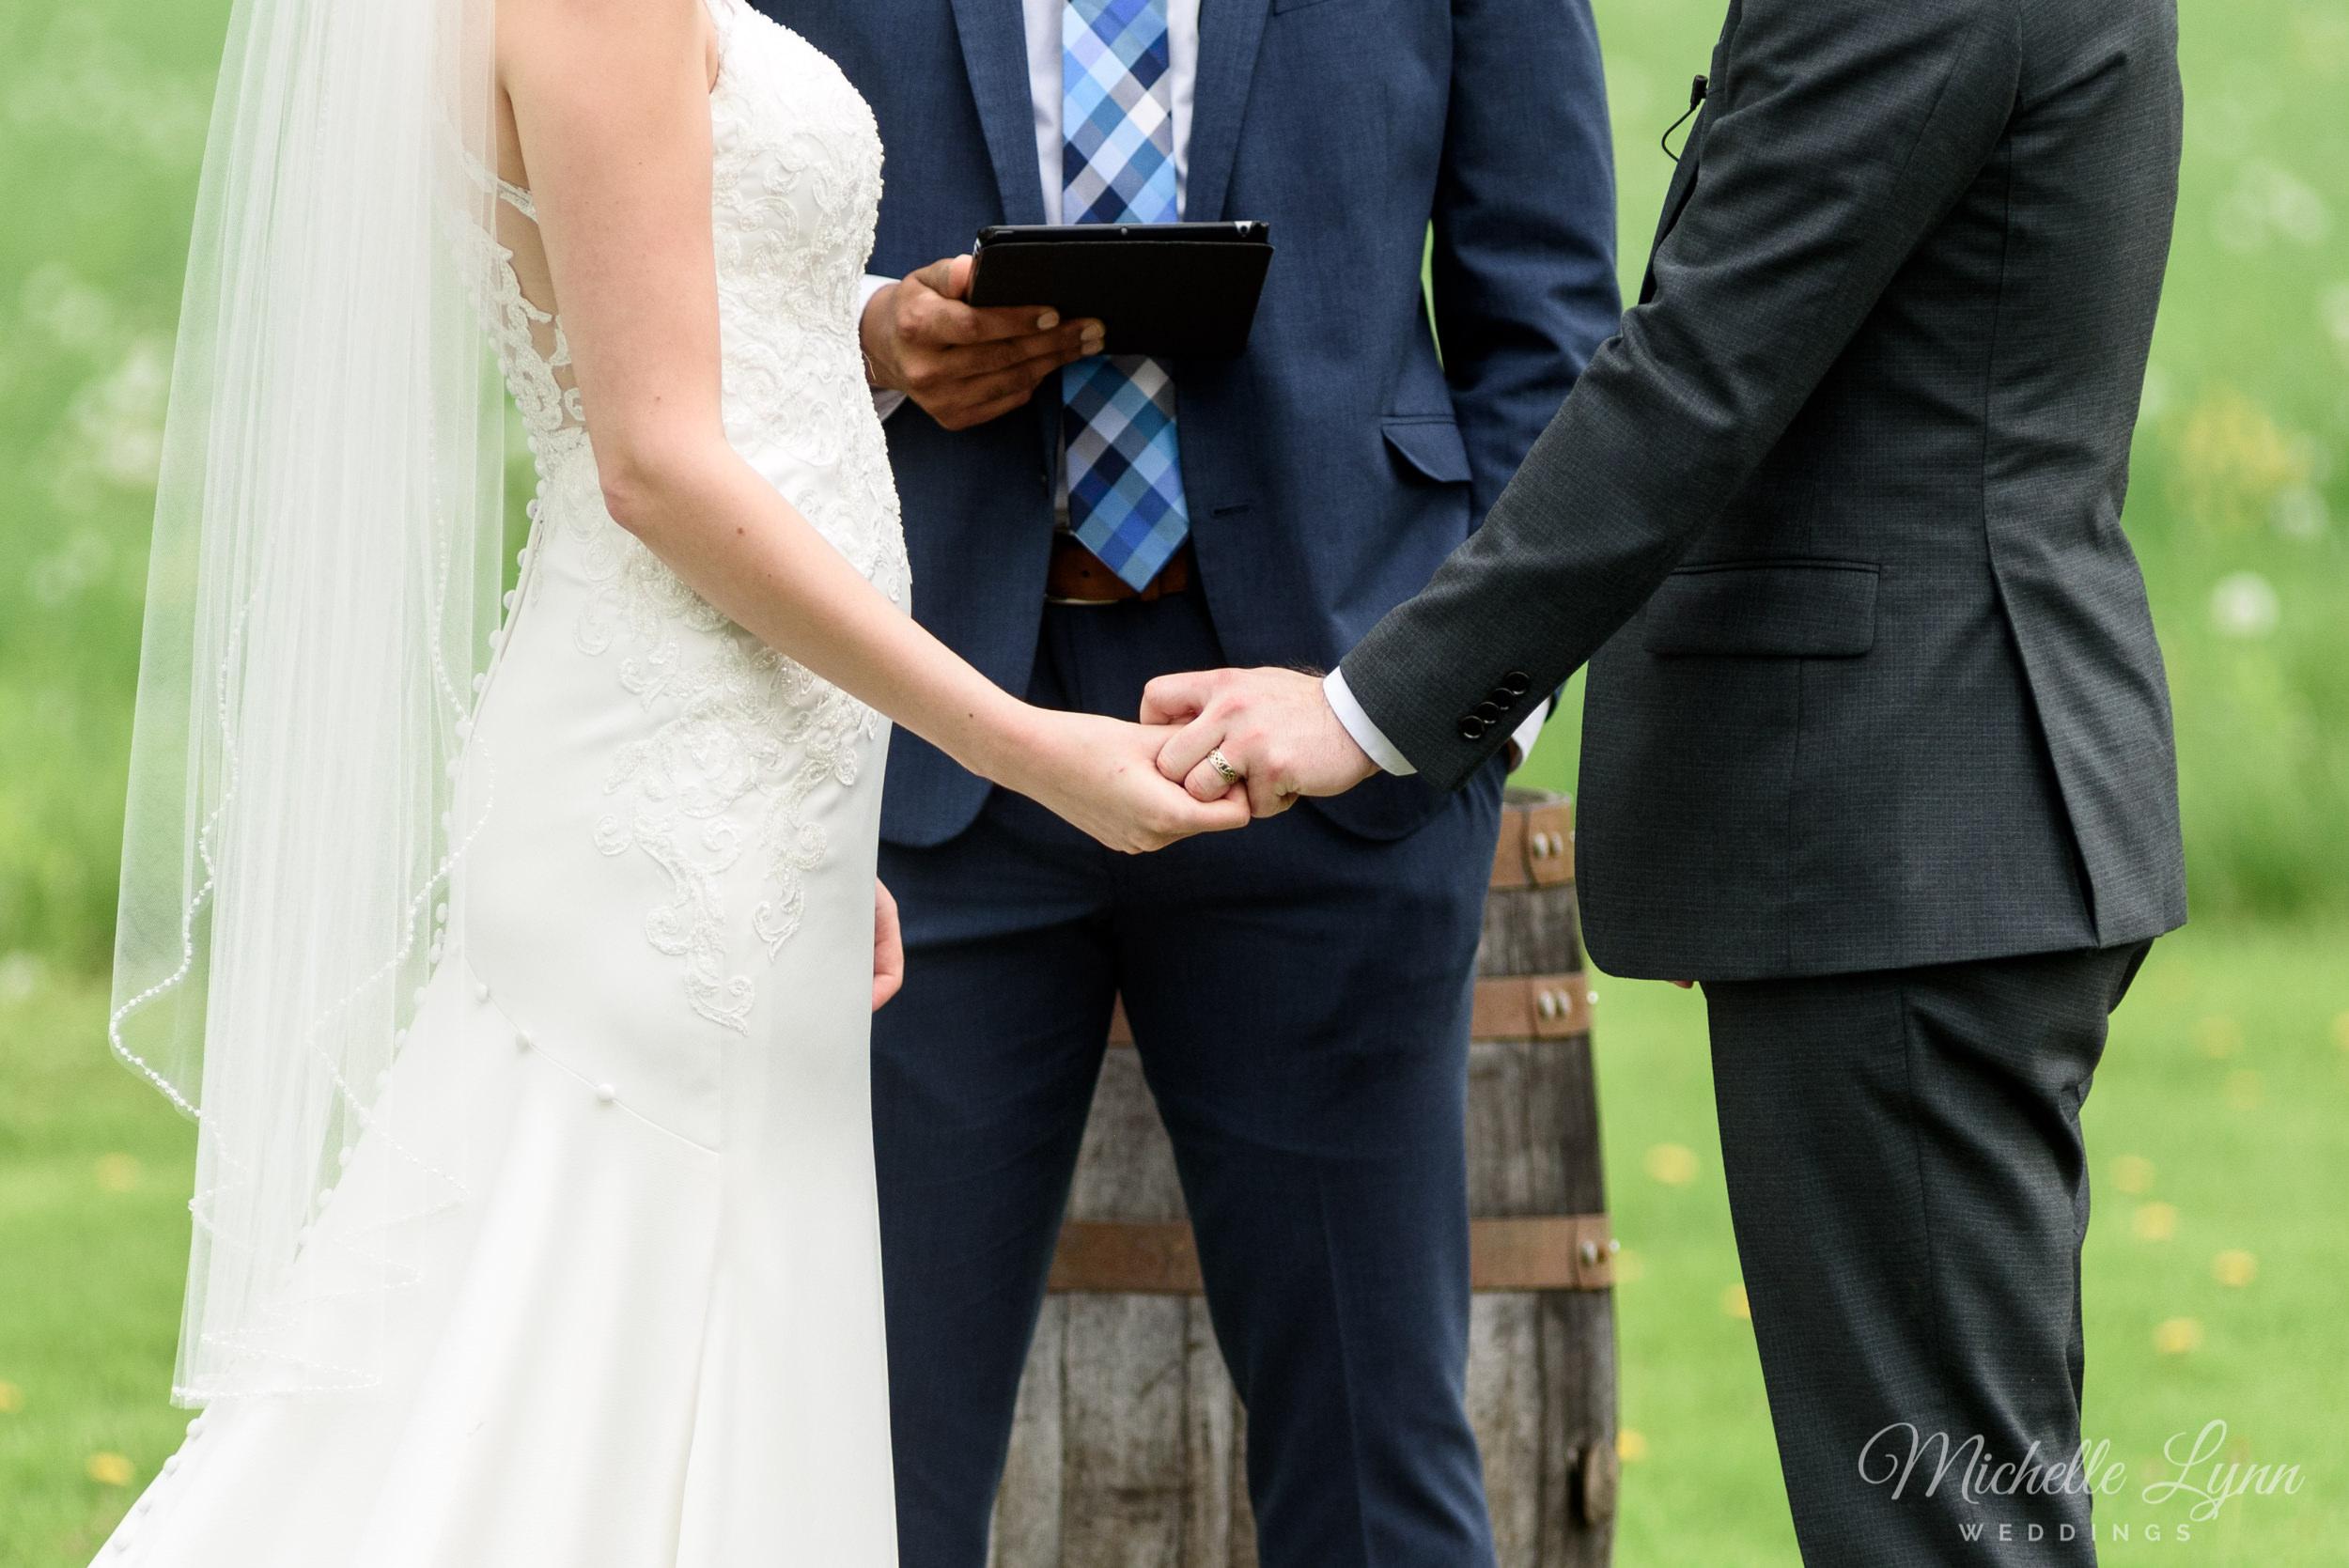 mlw-the-farm-bakery-and-events-wedding-photos-44.jpg